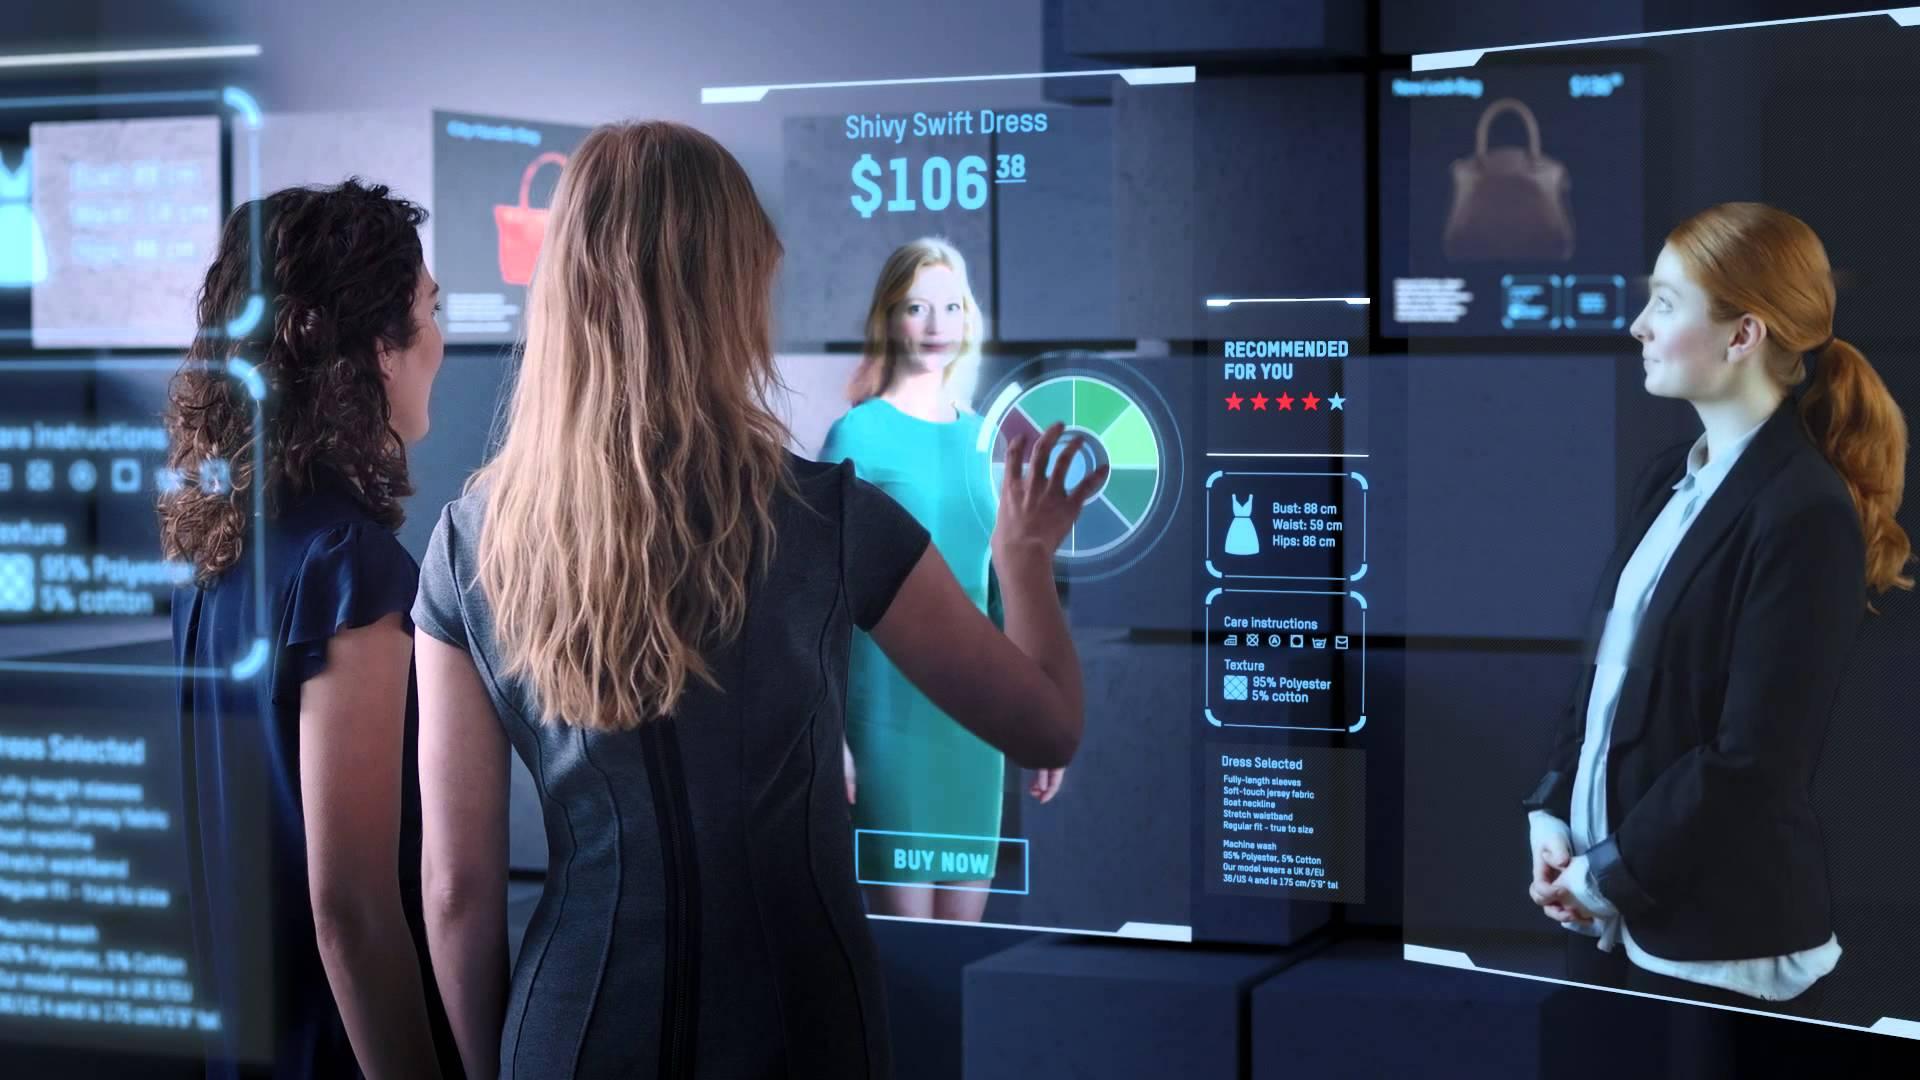 3d Live Wallpaper Windows 10 E Brick And Mortar The Future Of Shopping Else